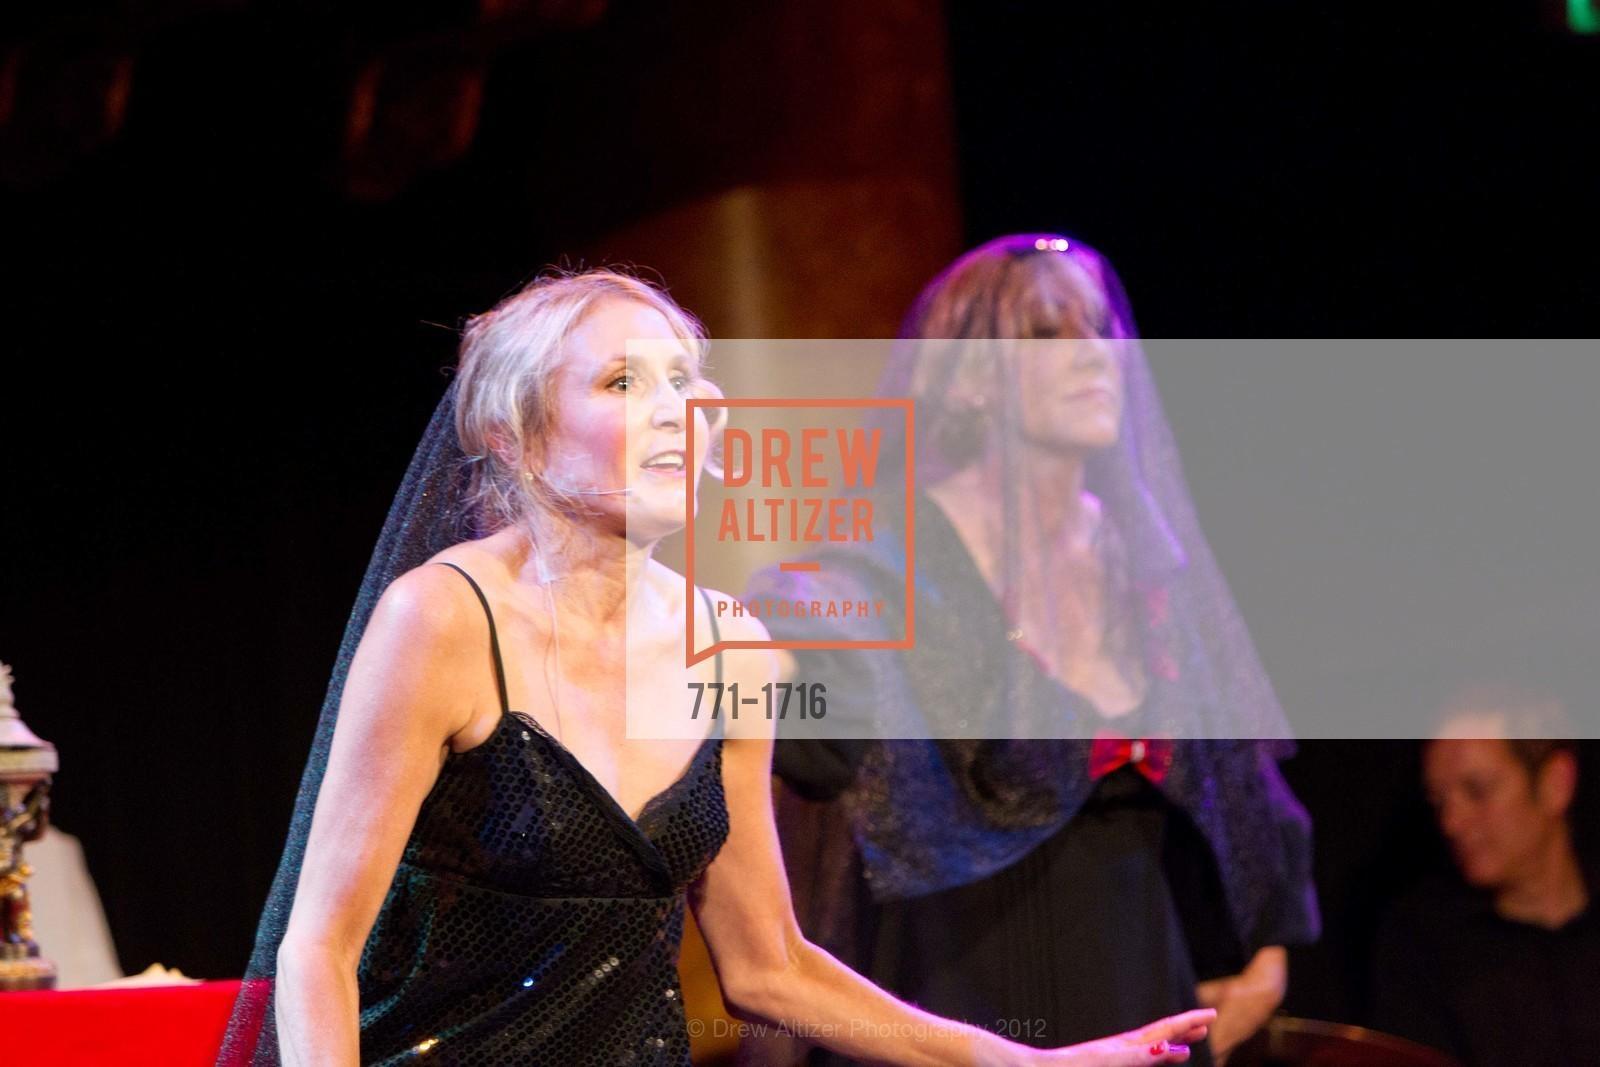 Performance, Photo #771-1716